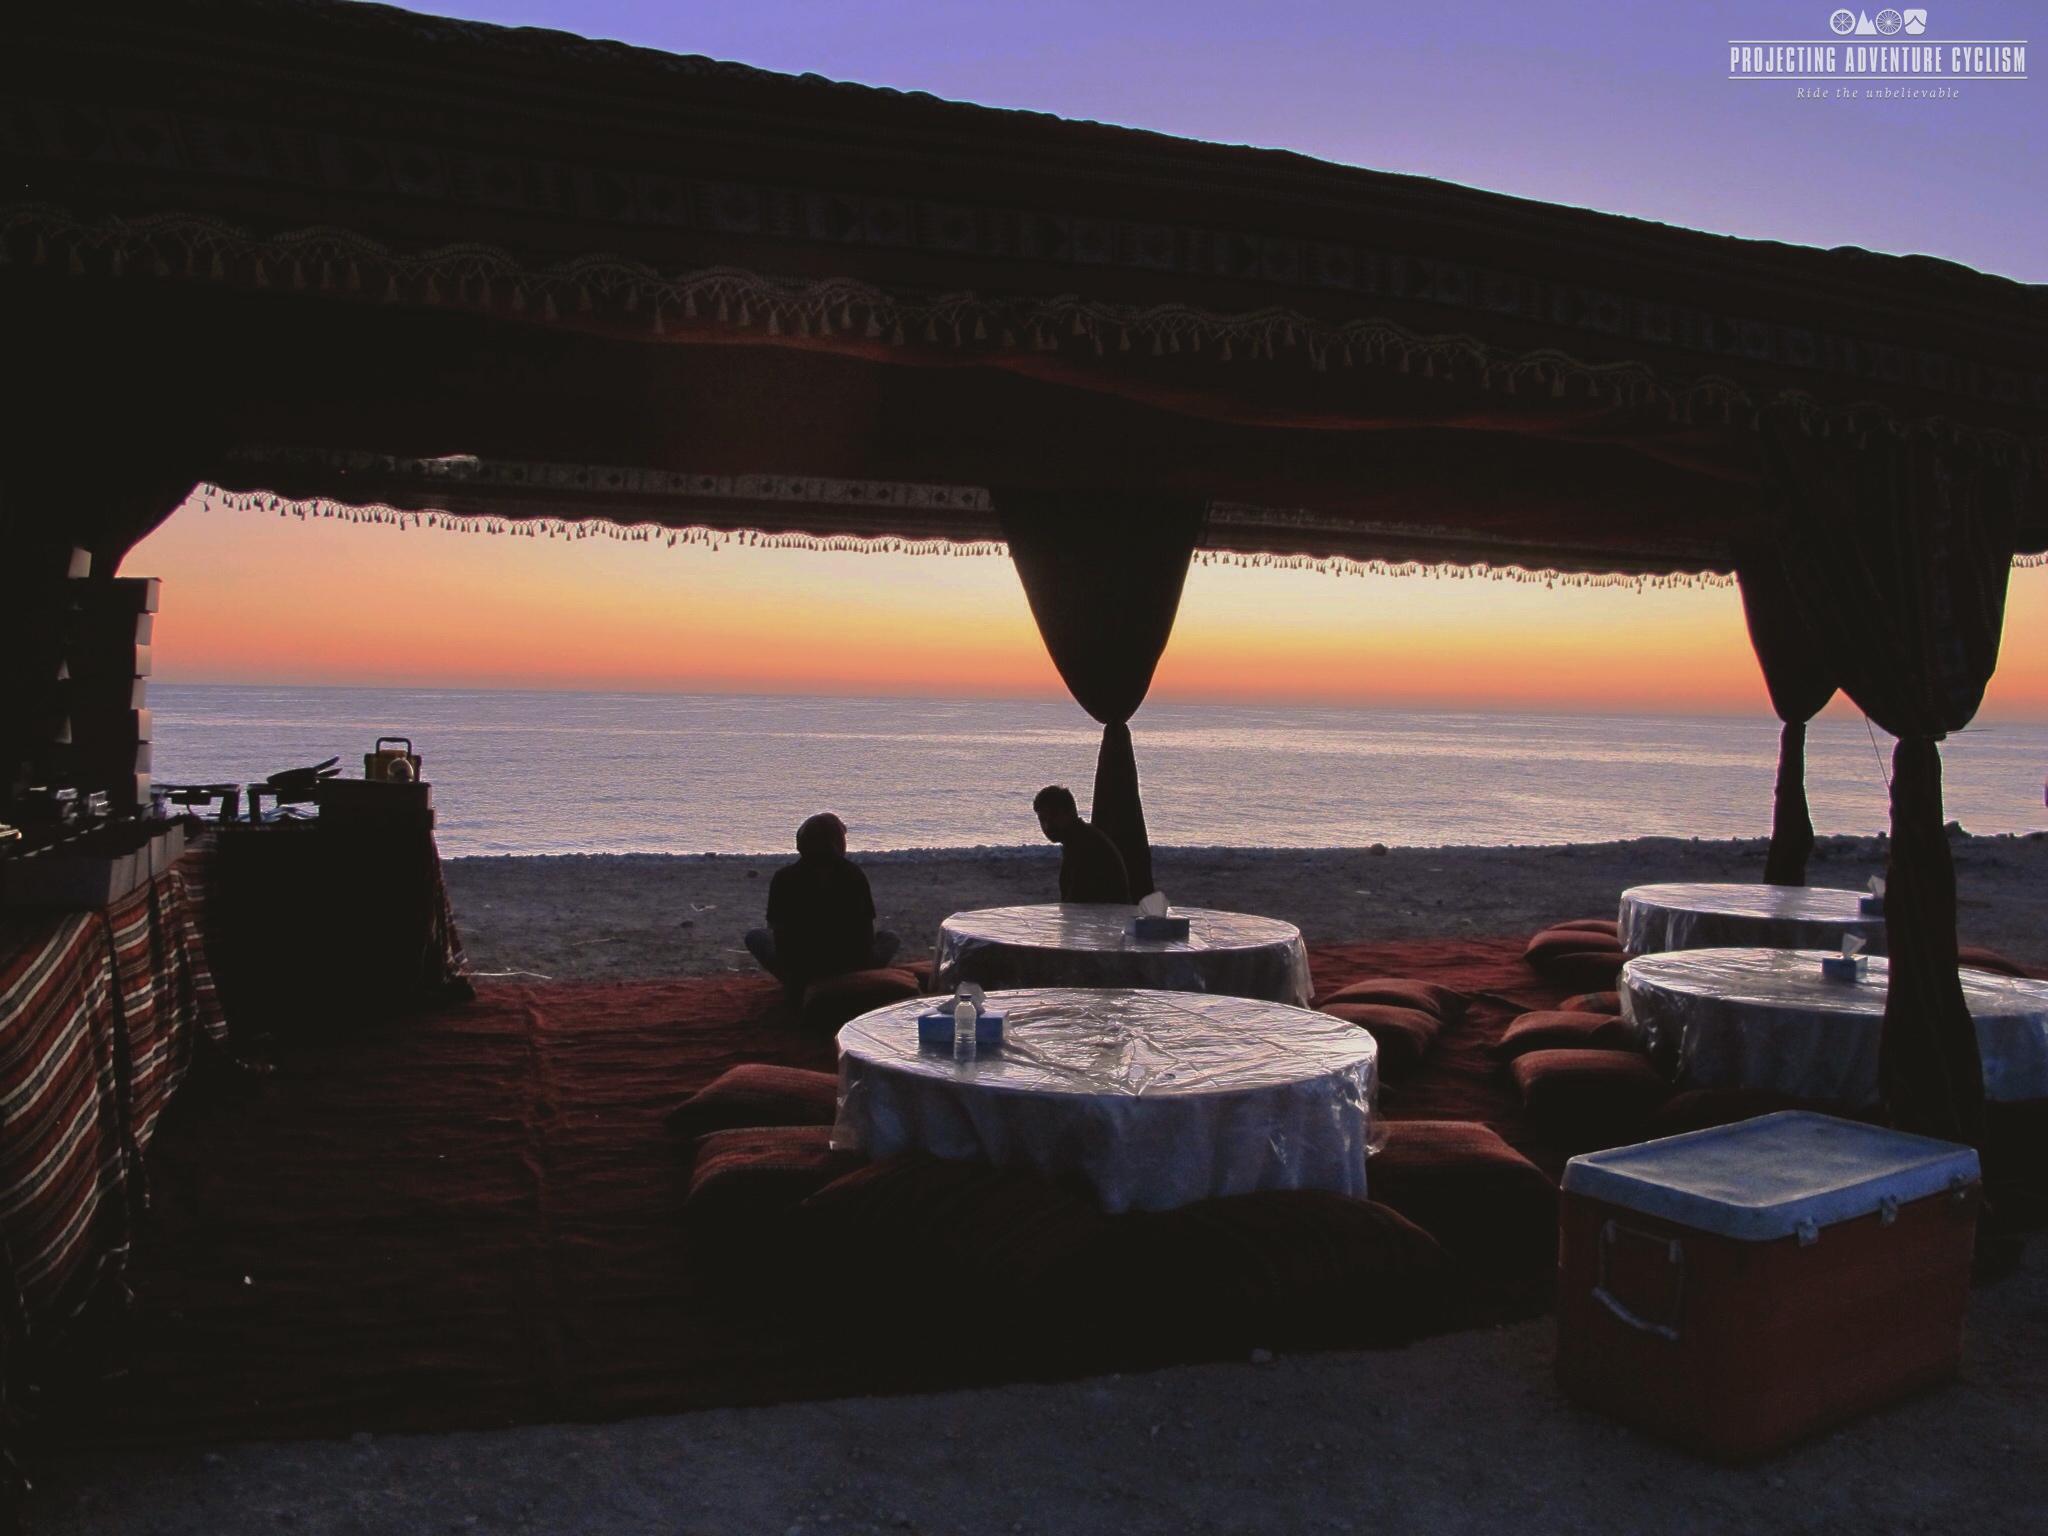 Relaxing in Oman